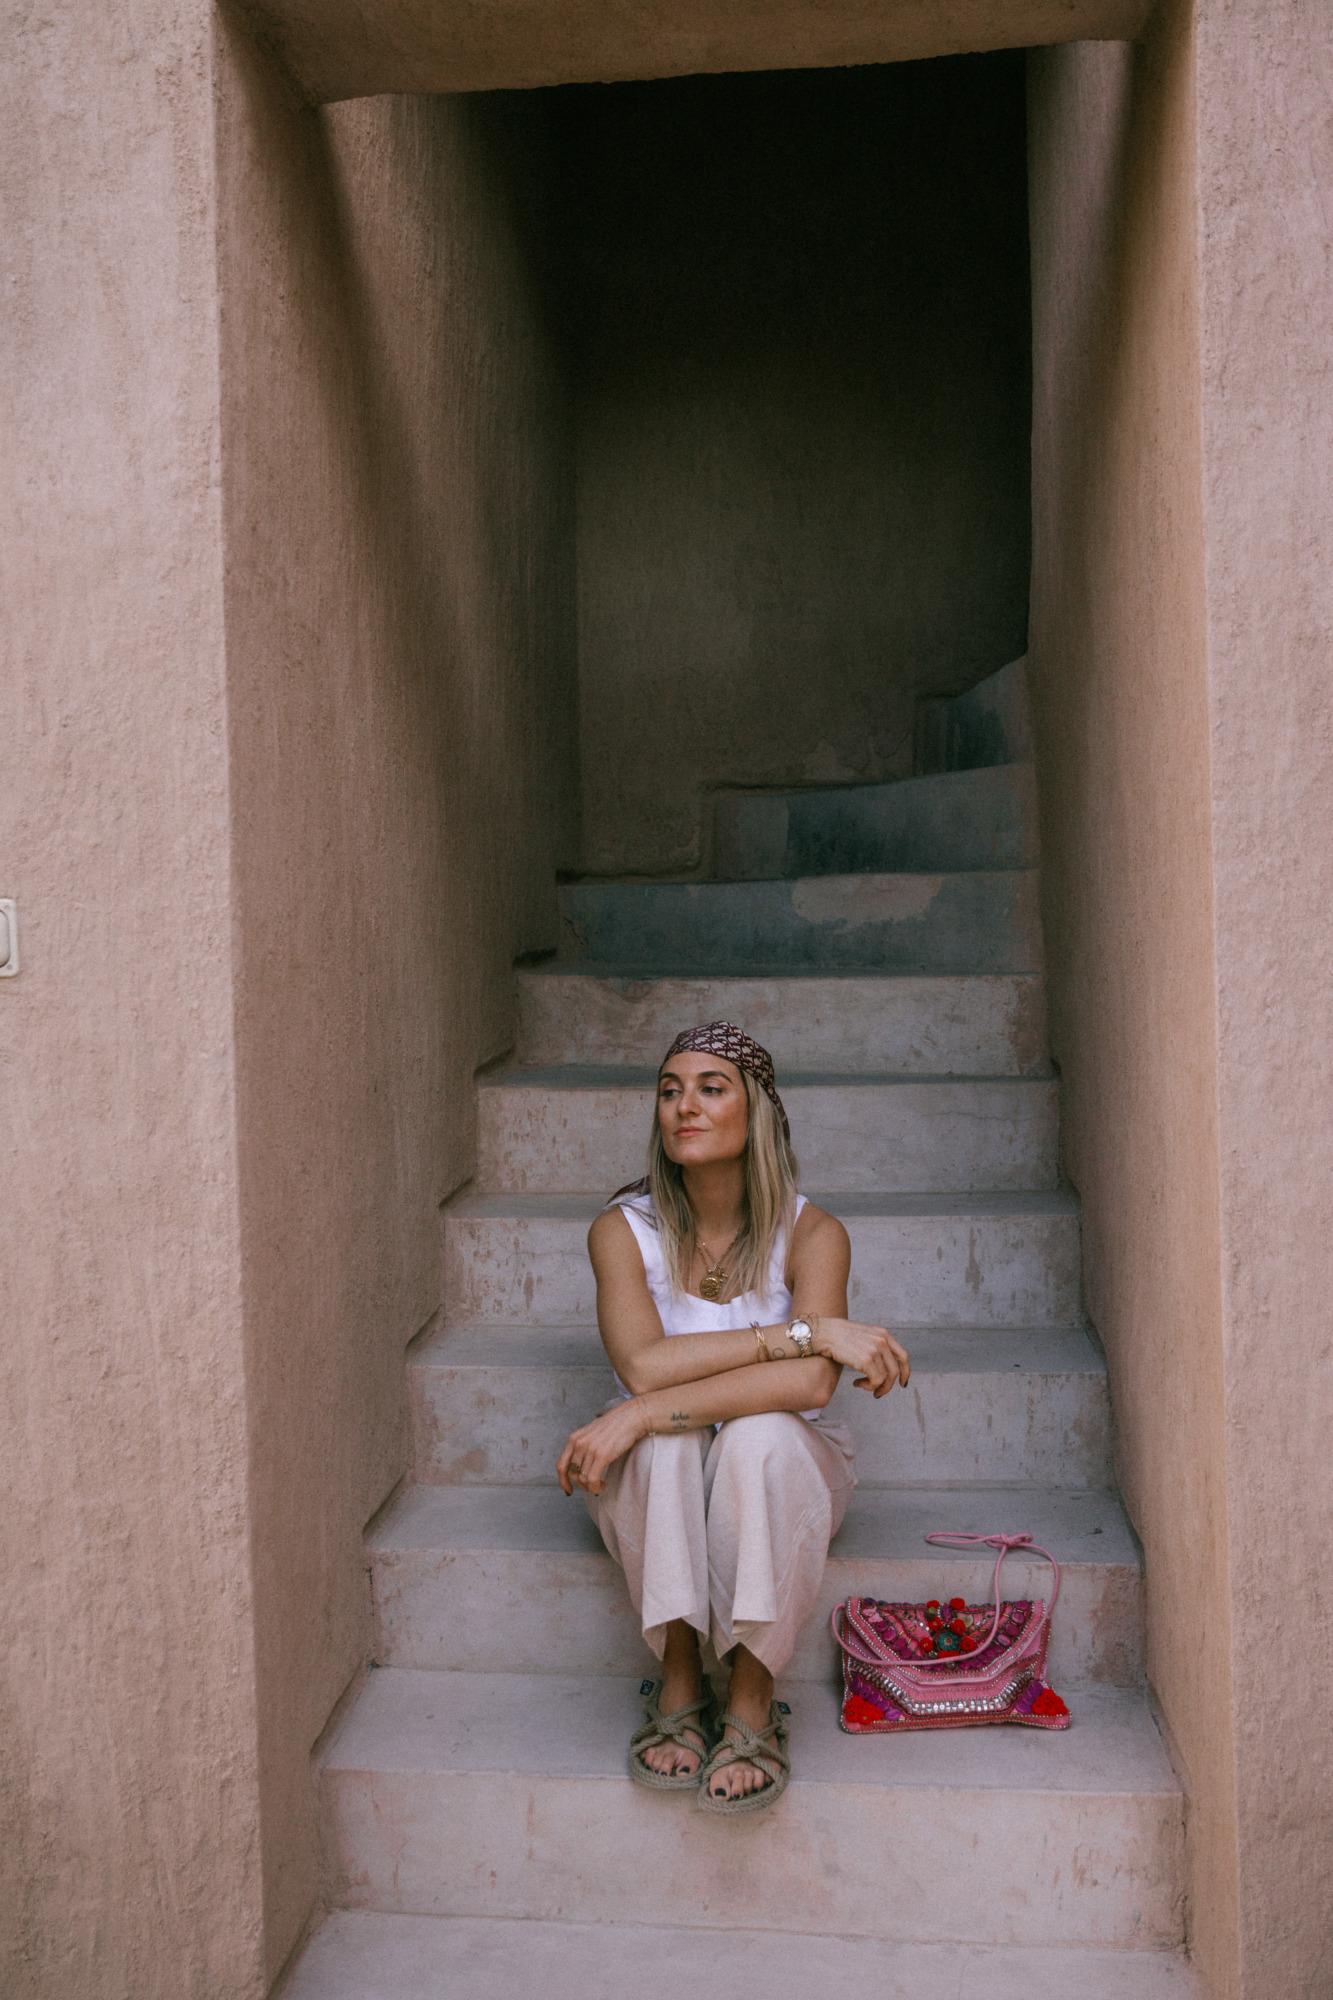 Dubaï blog voyages - Blondie Baby blog voyages